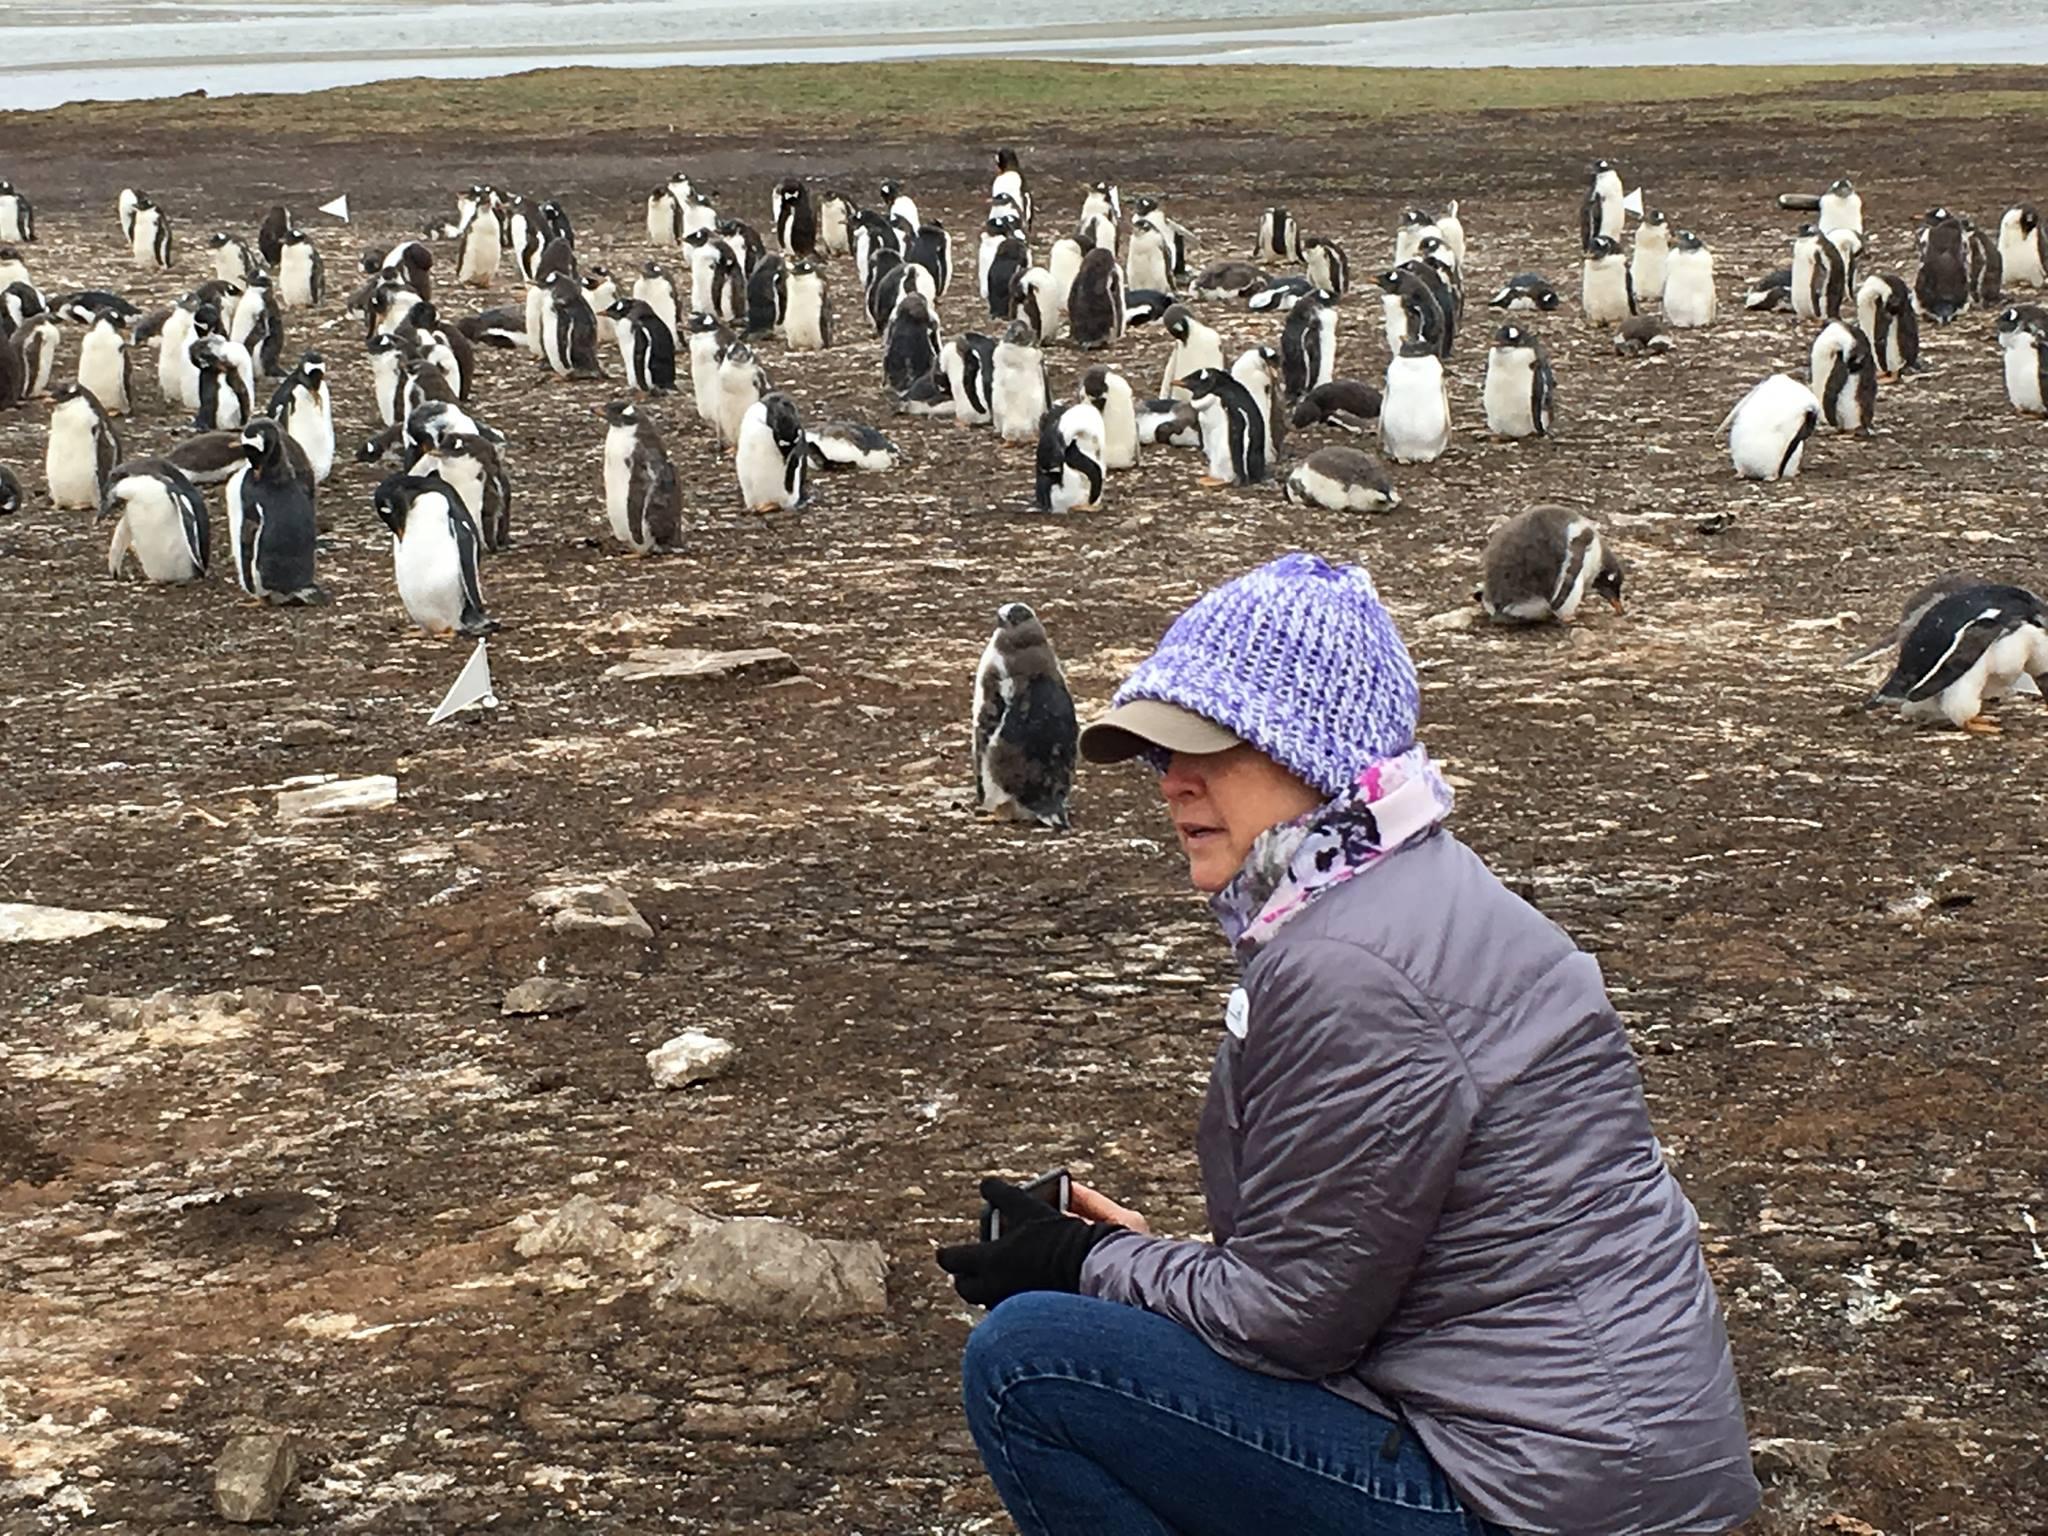 Jill artic with penguins.jpg